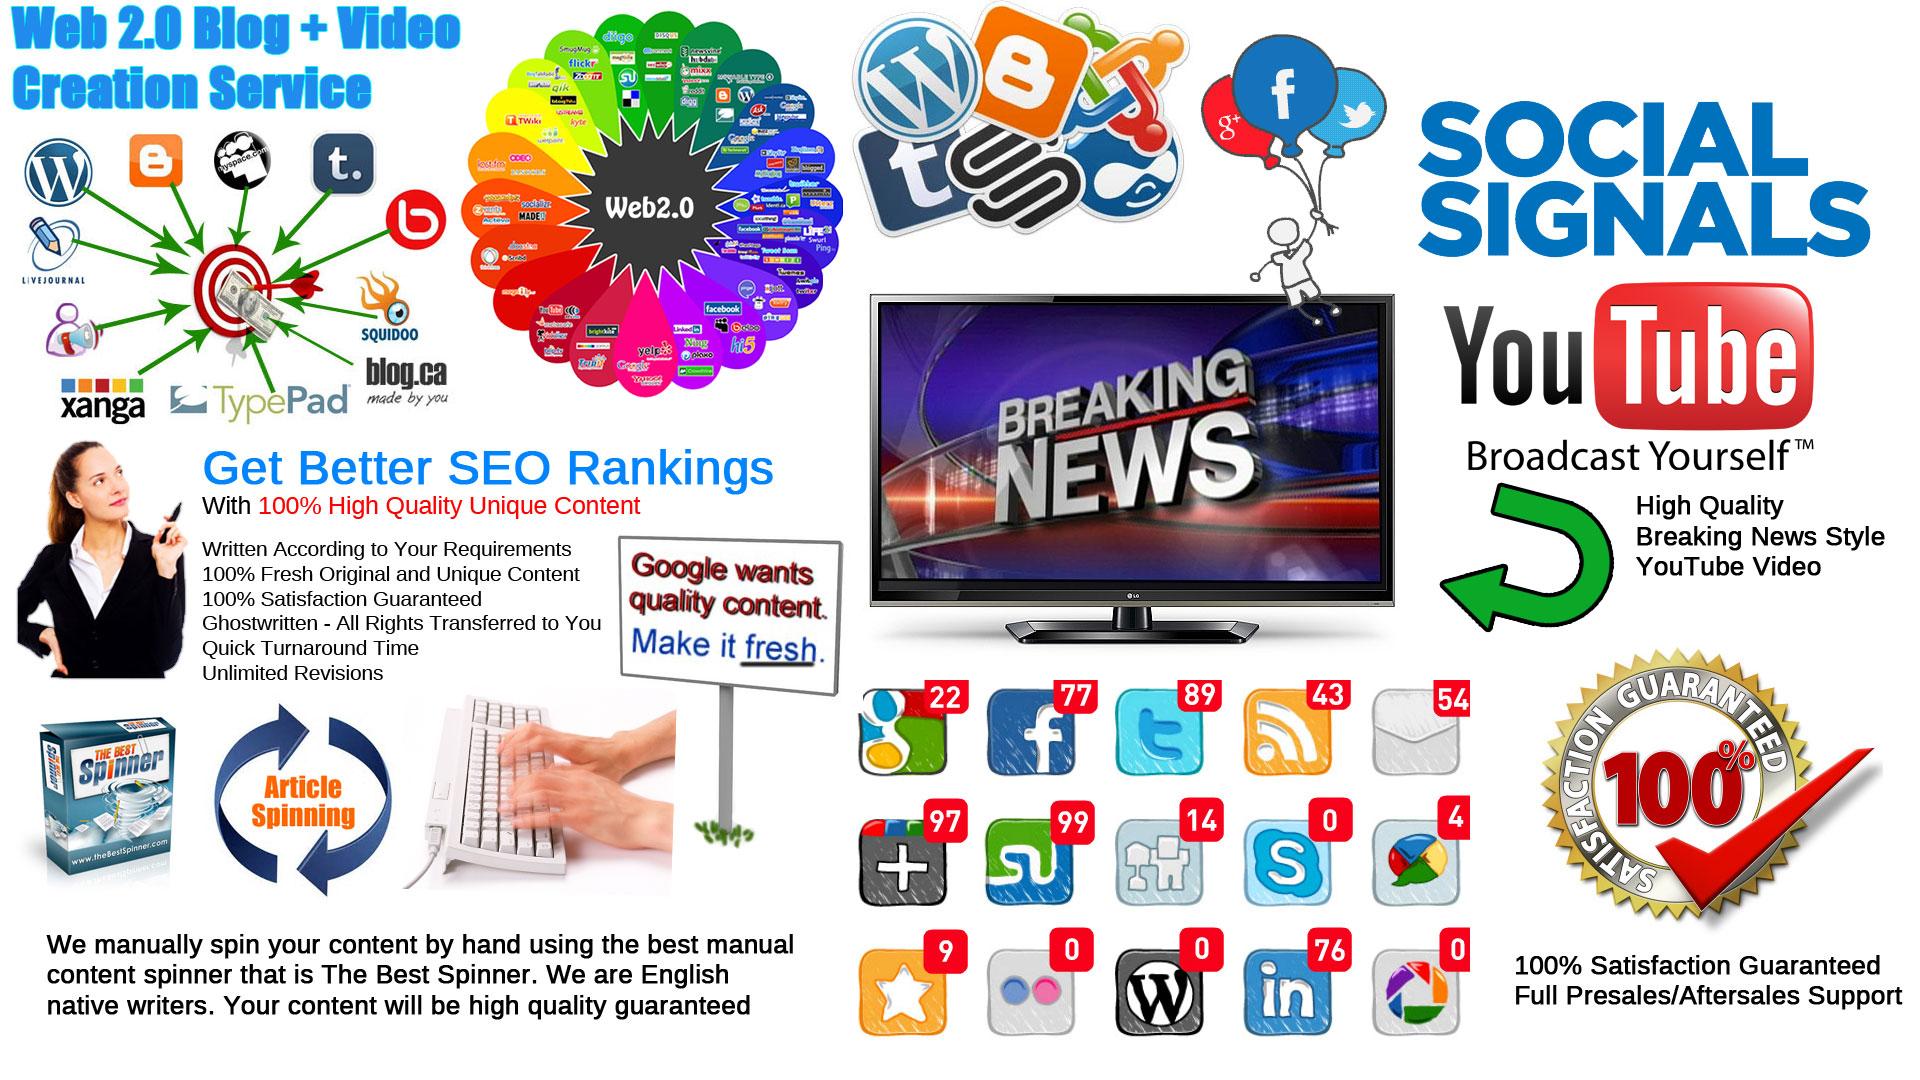 Top 25 Web 2.0 Blogs Network Creation Service High Qu...